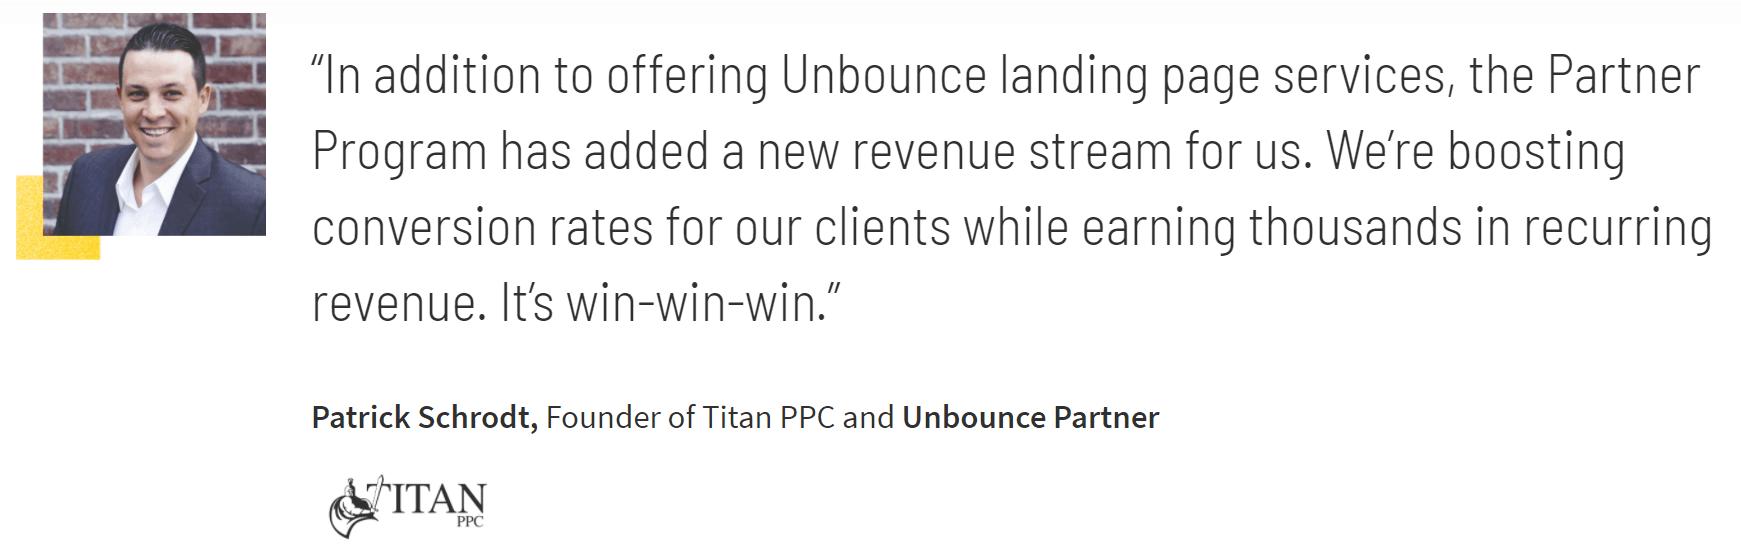 Unbounce partner testimonials